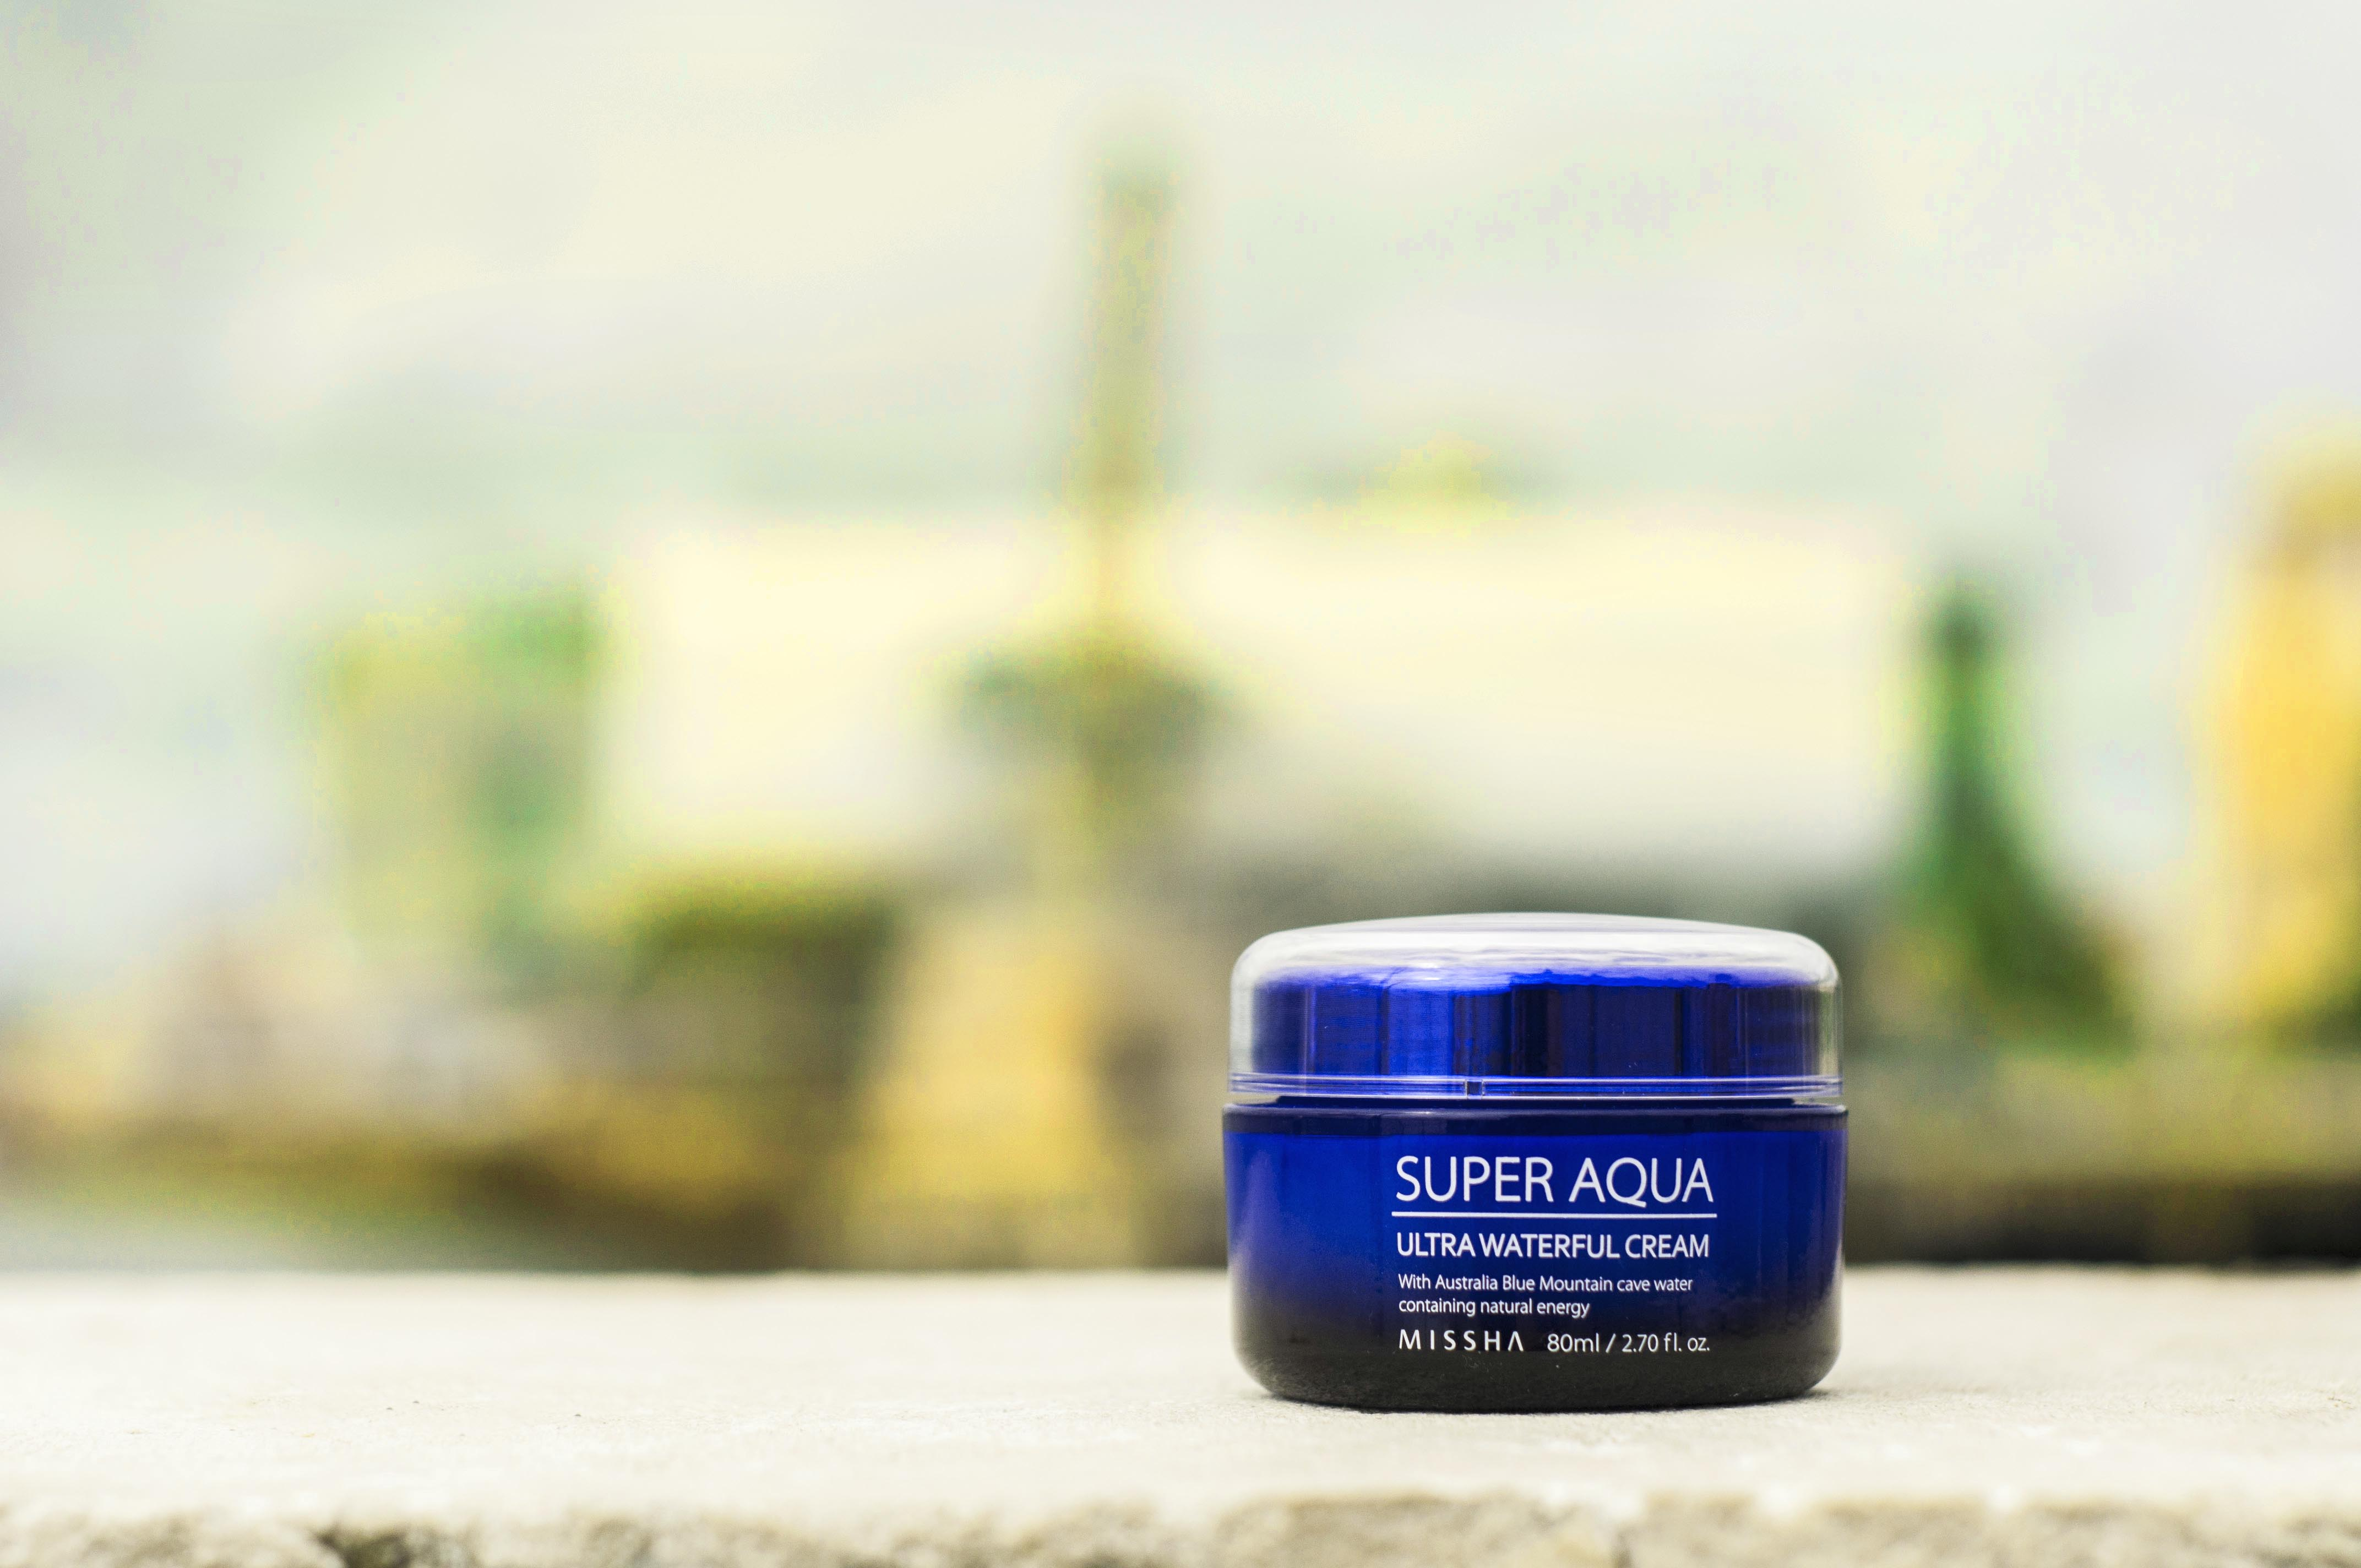 MISSHA-superaqua-cream-Blueberry Cosmetics tratar las manchas